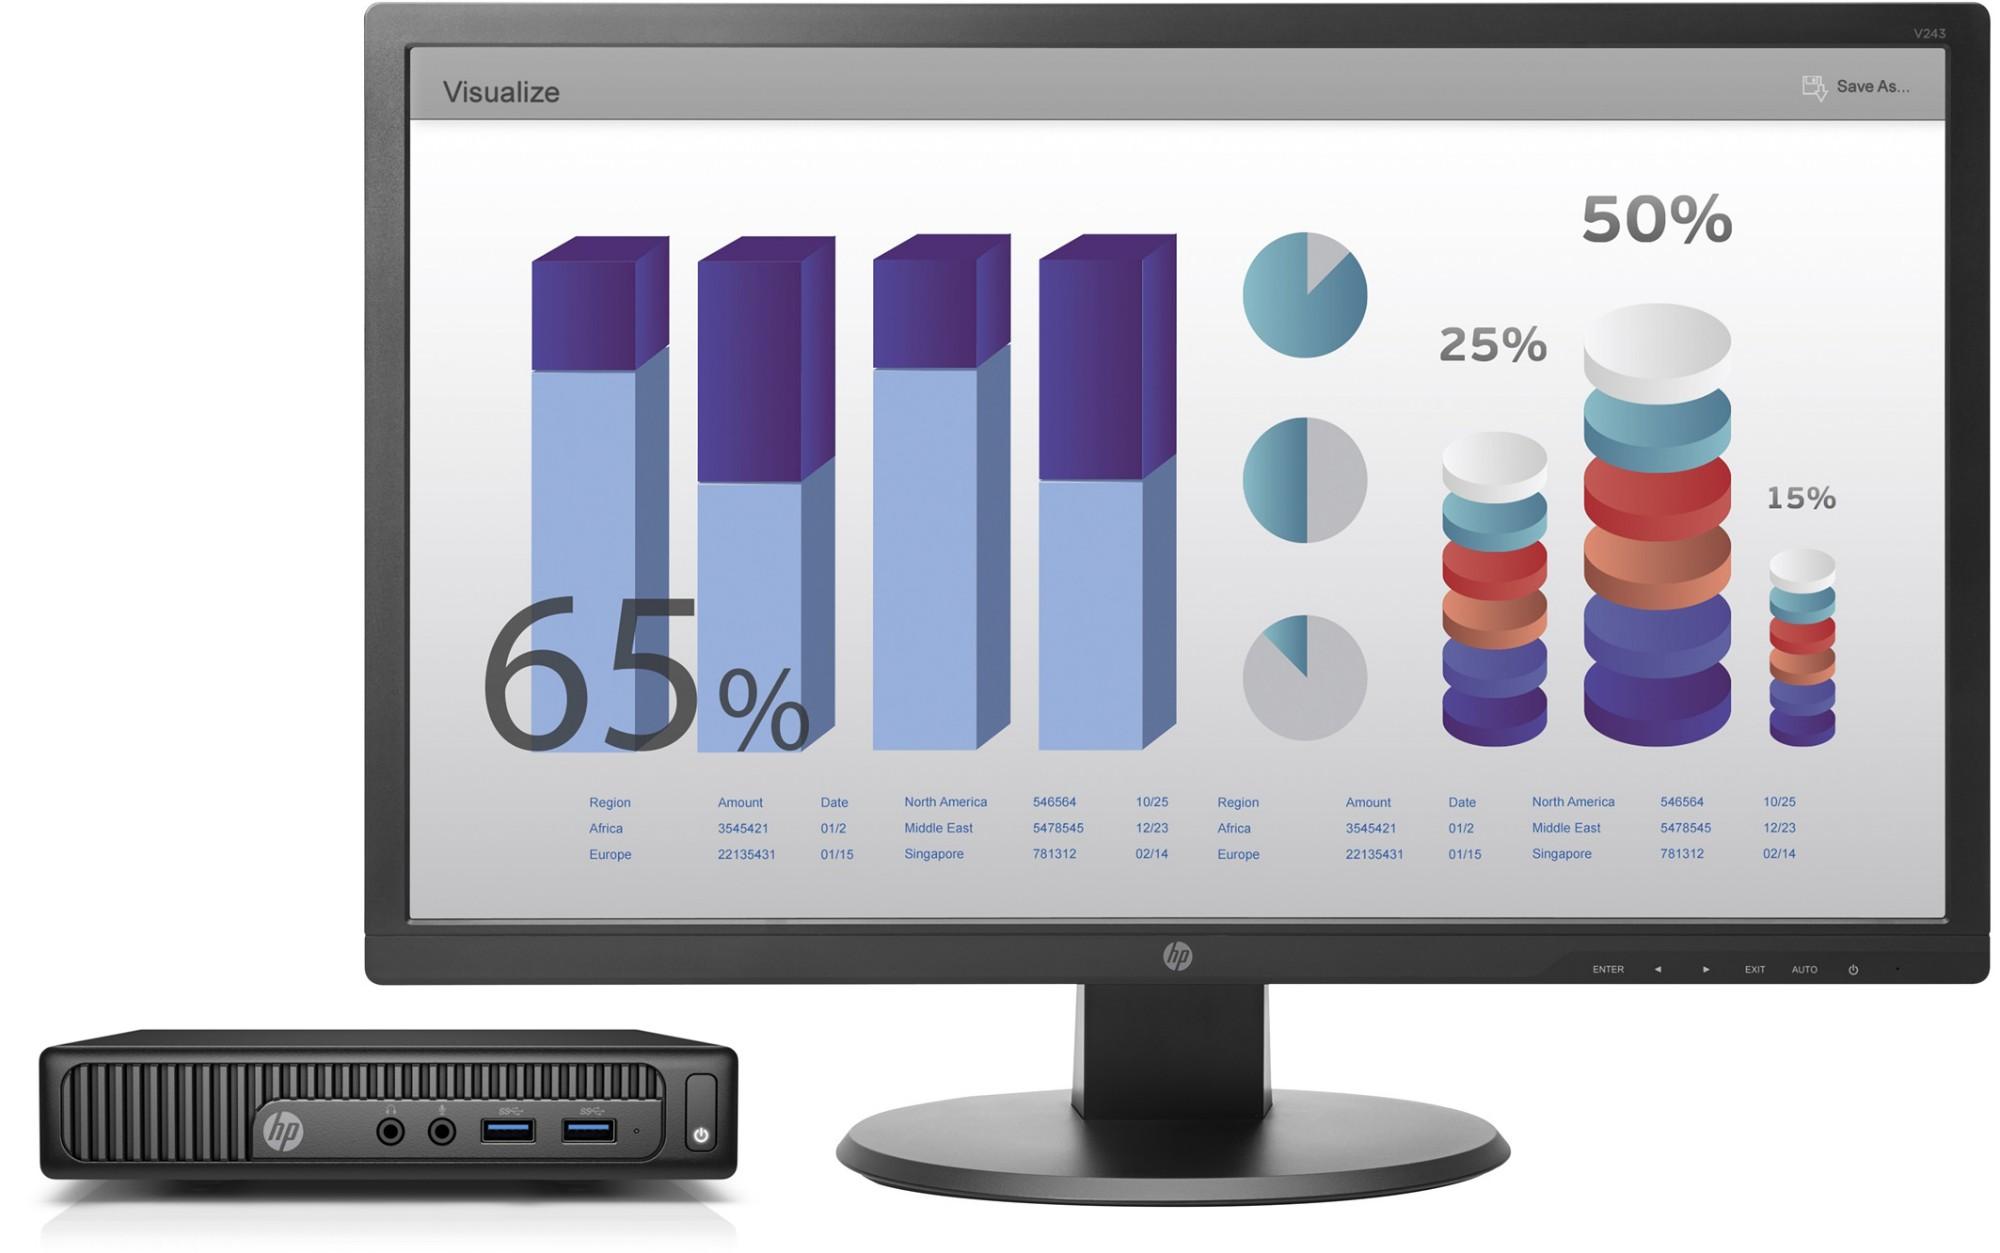 HP 260 G2 Mini + V243 3.7GHz i3-6100 Desktop Black Mini PC